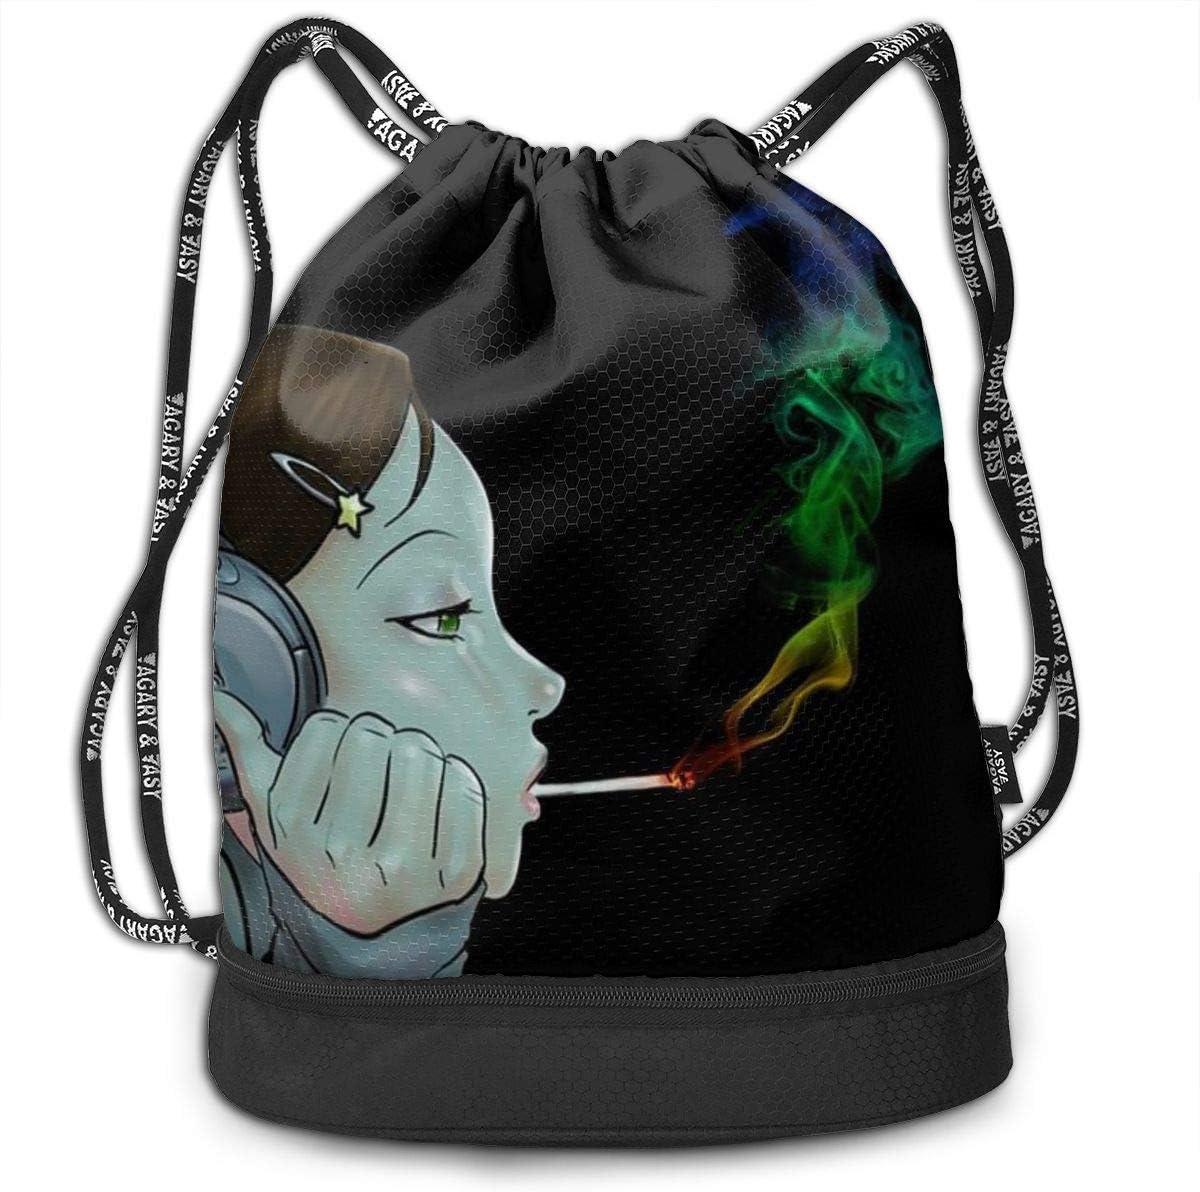 GymSack Drawstring Bag Sackpack Rebellious Girl Sport Cinch Pack Simple Bundle Pocke Backpack For Men Women